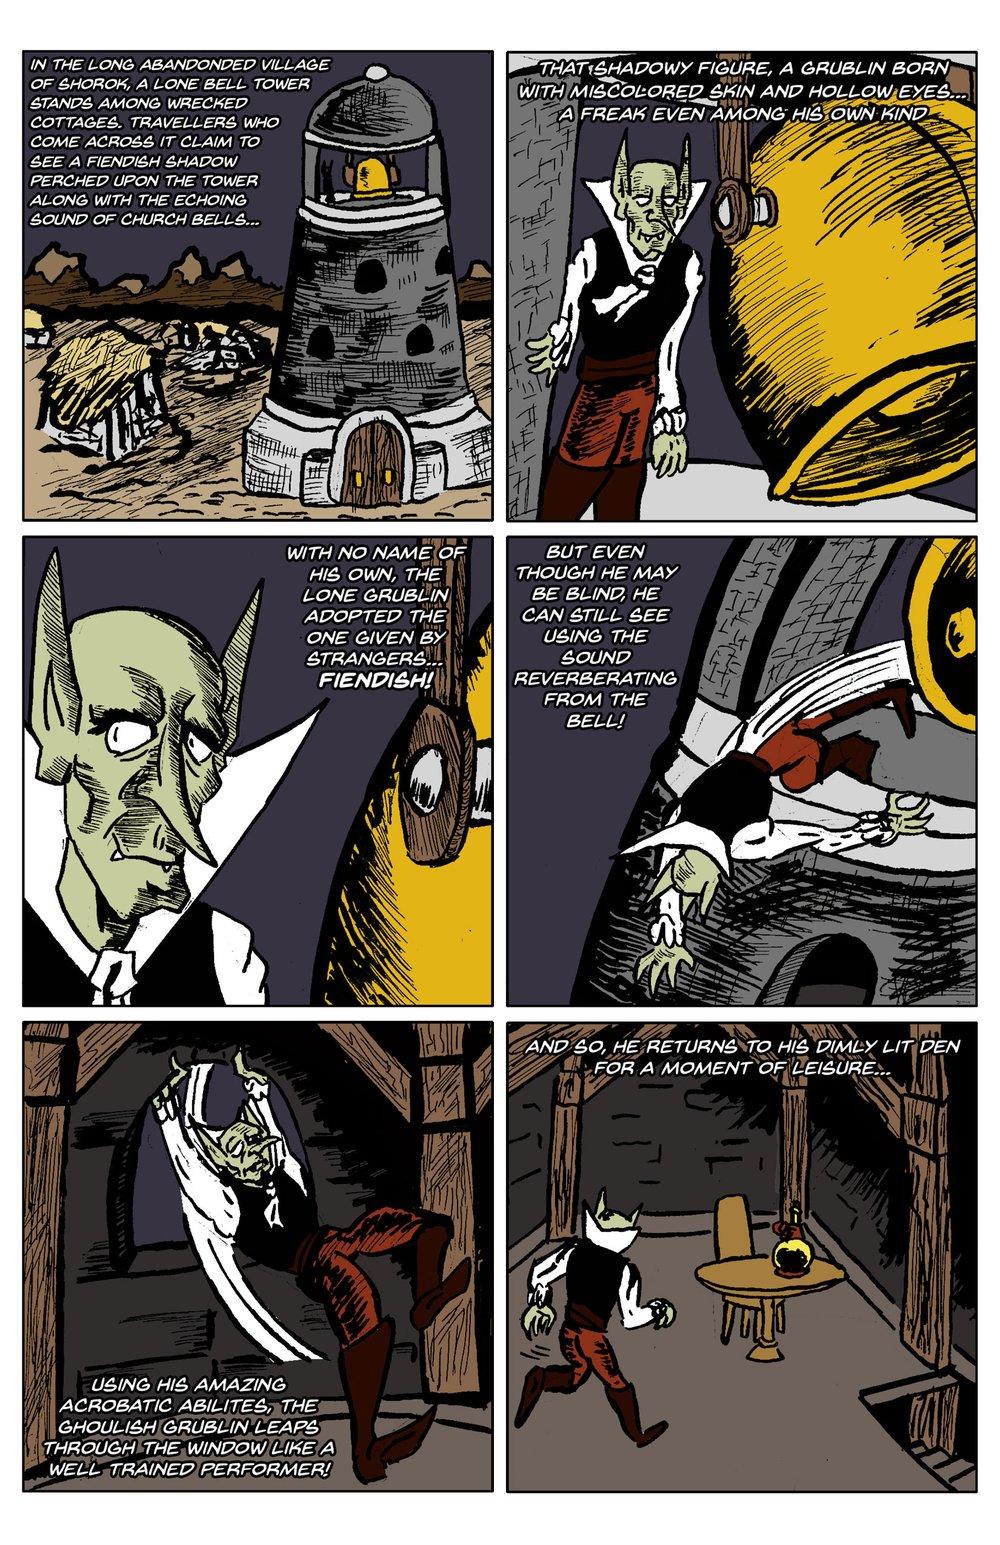 Grublins: Boiler's Quest